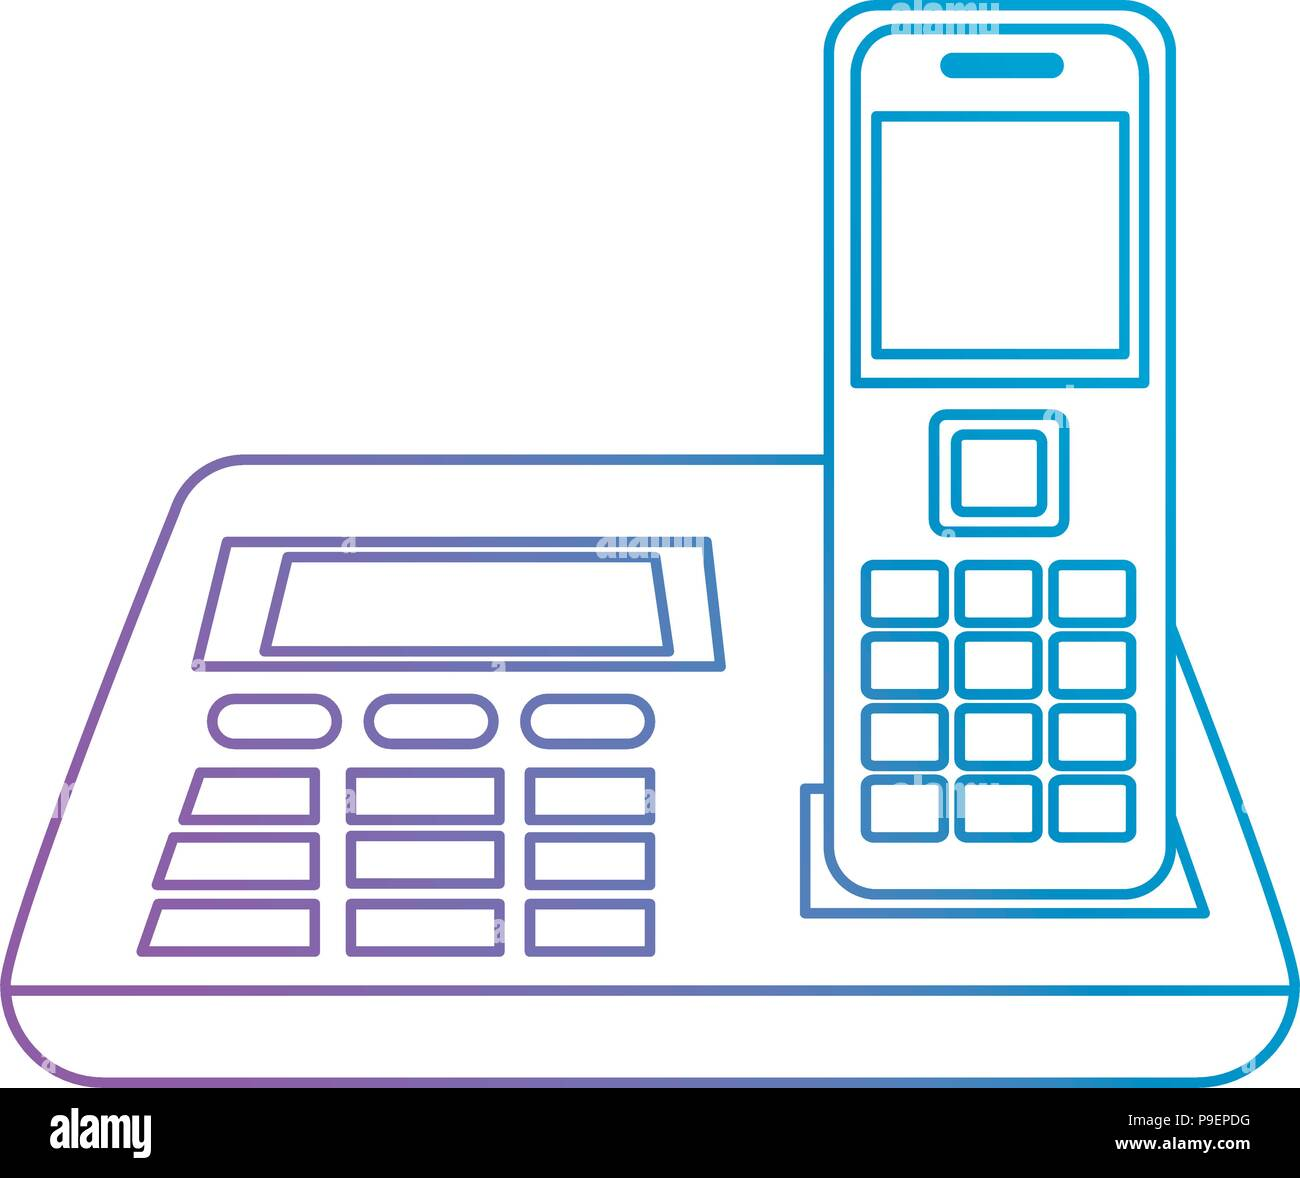 office digital telephone icon - Stock Vector